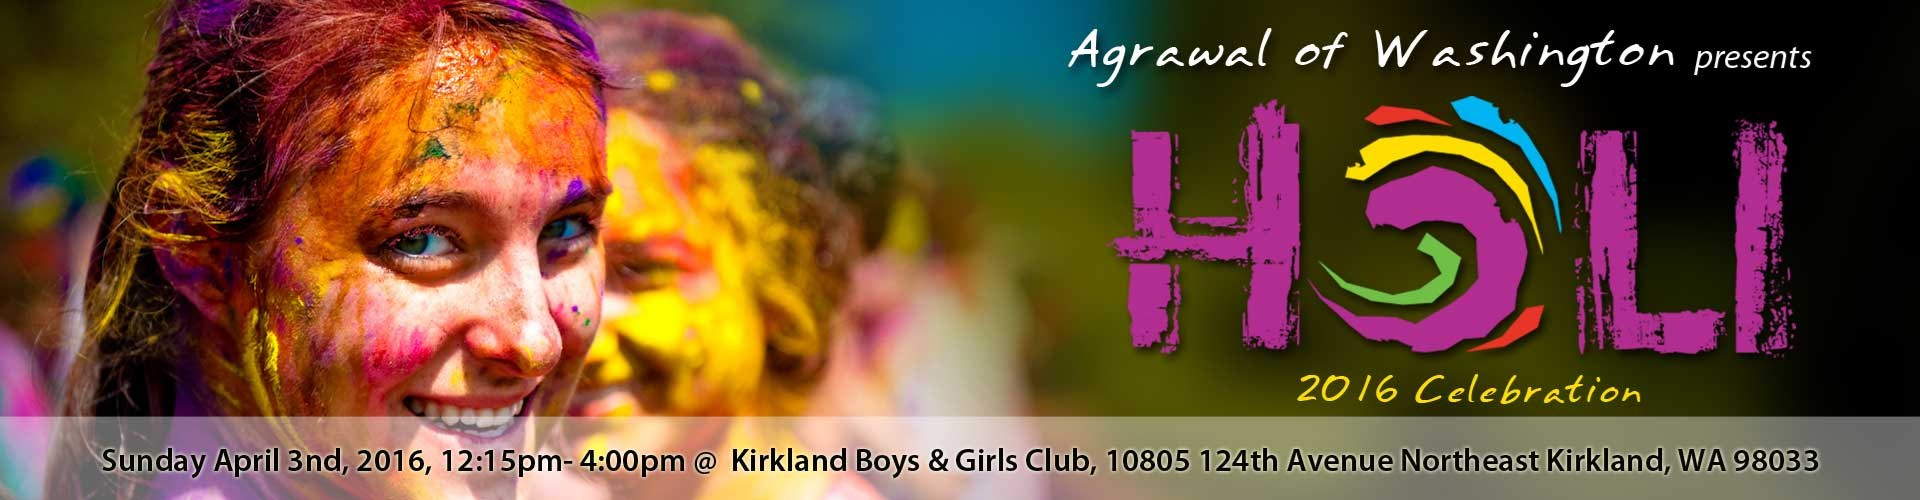 Agrawal of Washington 2016 Holi Celebration at Kirkland Boys and ...